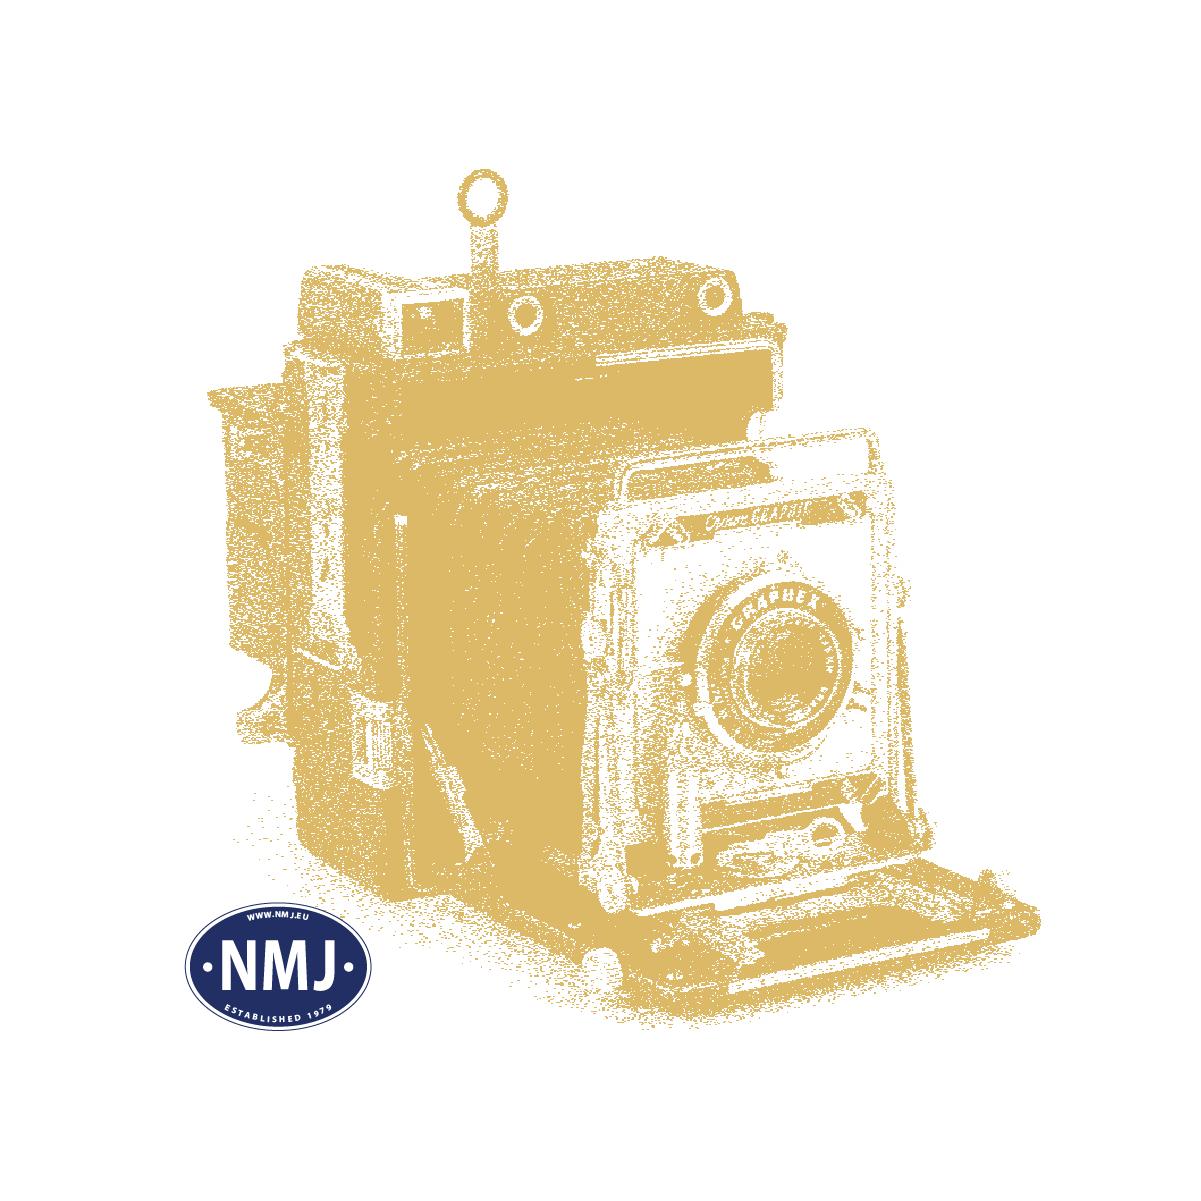 NMJ0G4-3 - NMJ Superline Modell des Gedeckten Güterwagens  Gbkls 2076 158 5796-9 der NSB, Spur 0